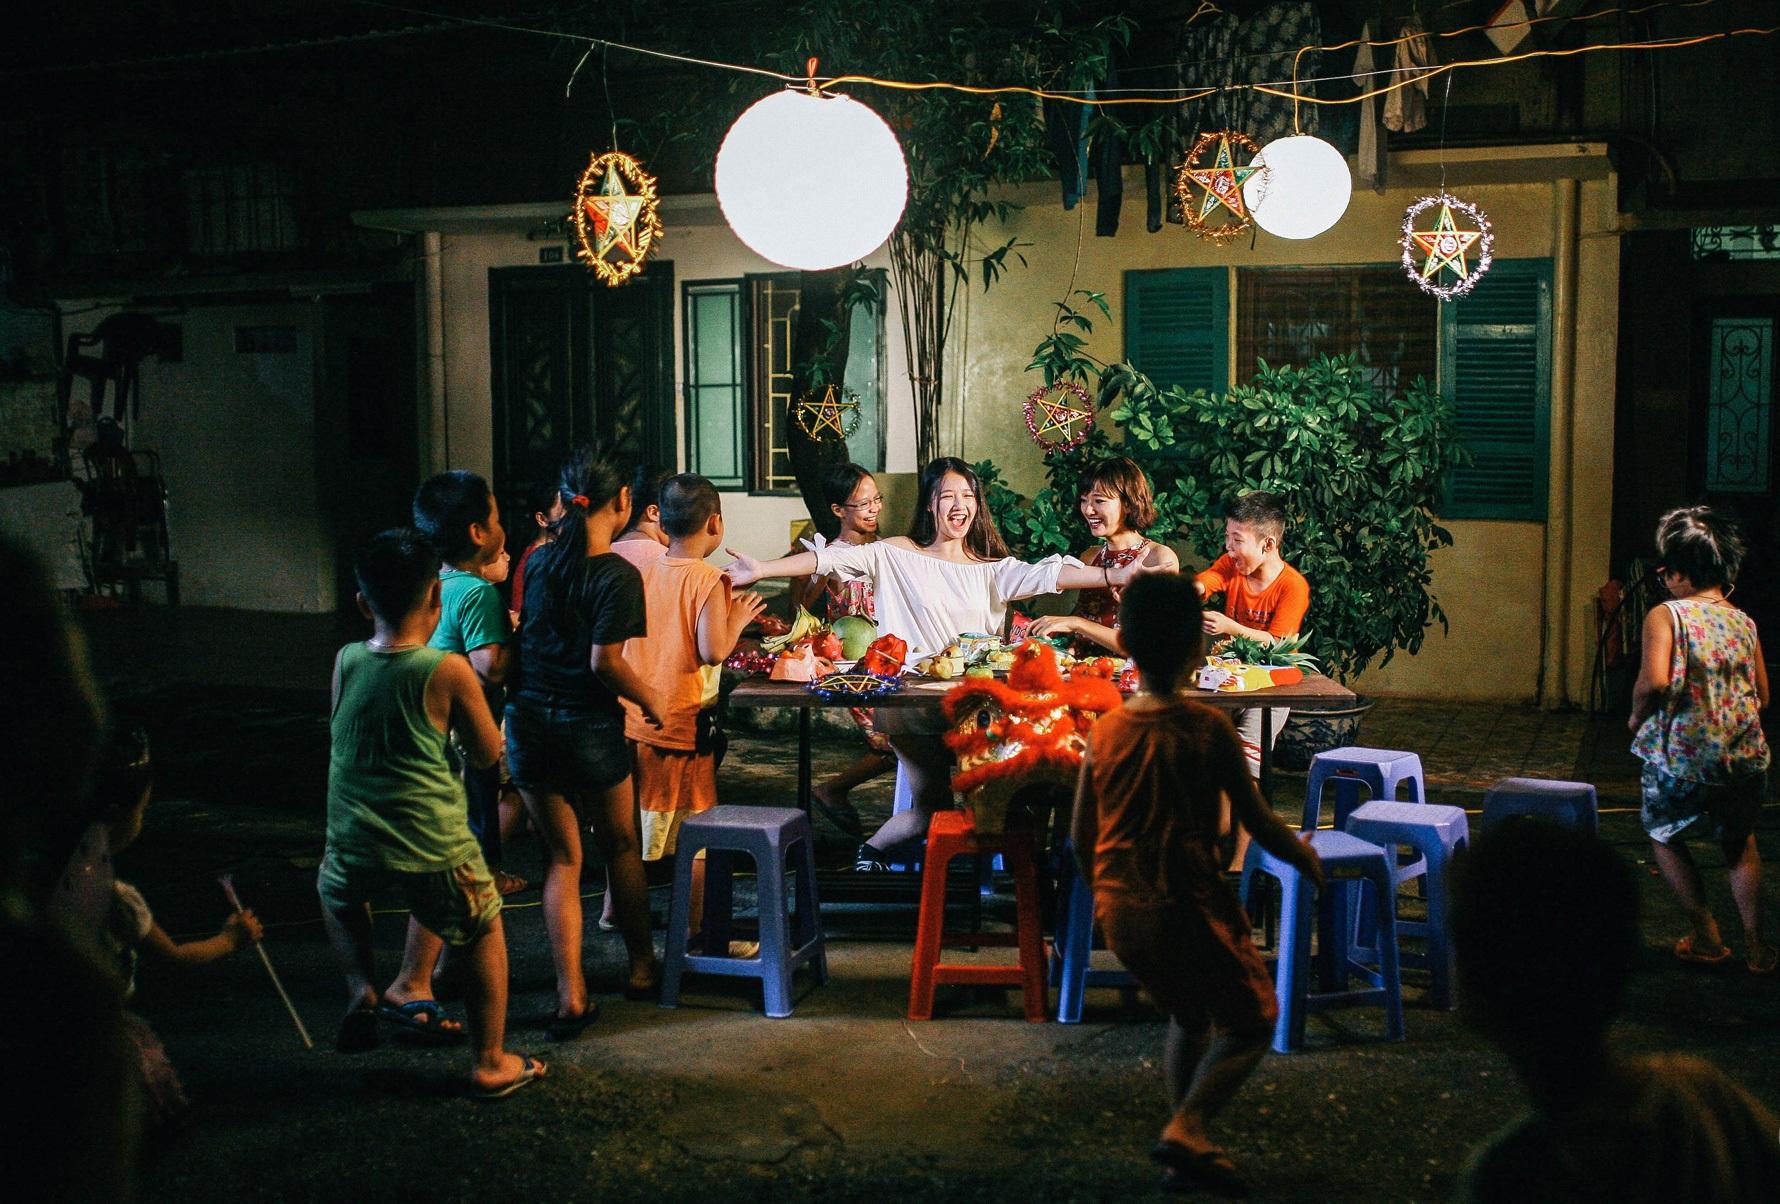 In Vietnam, Mid-Autumn Festival is traditional celebration for children